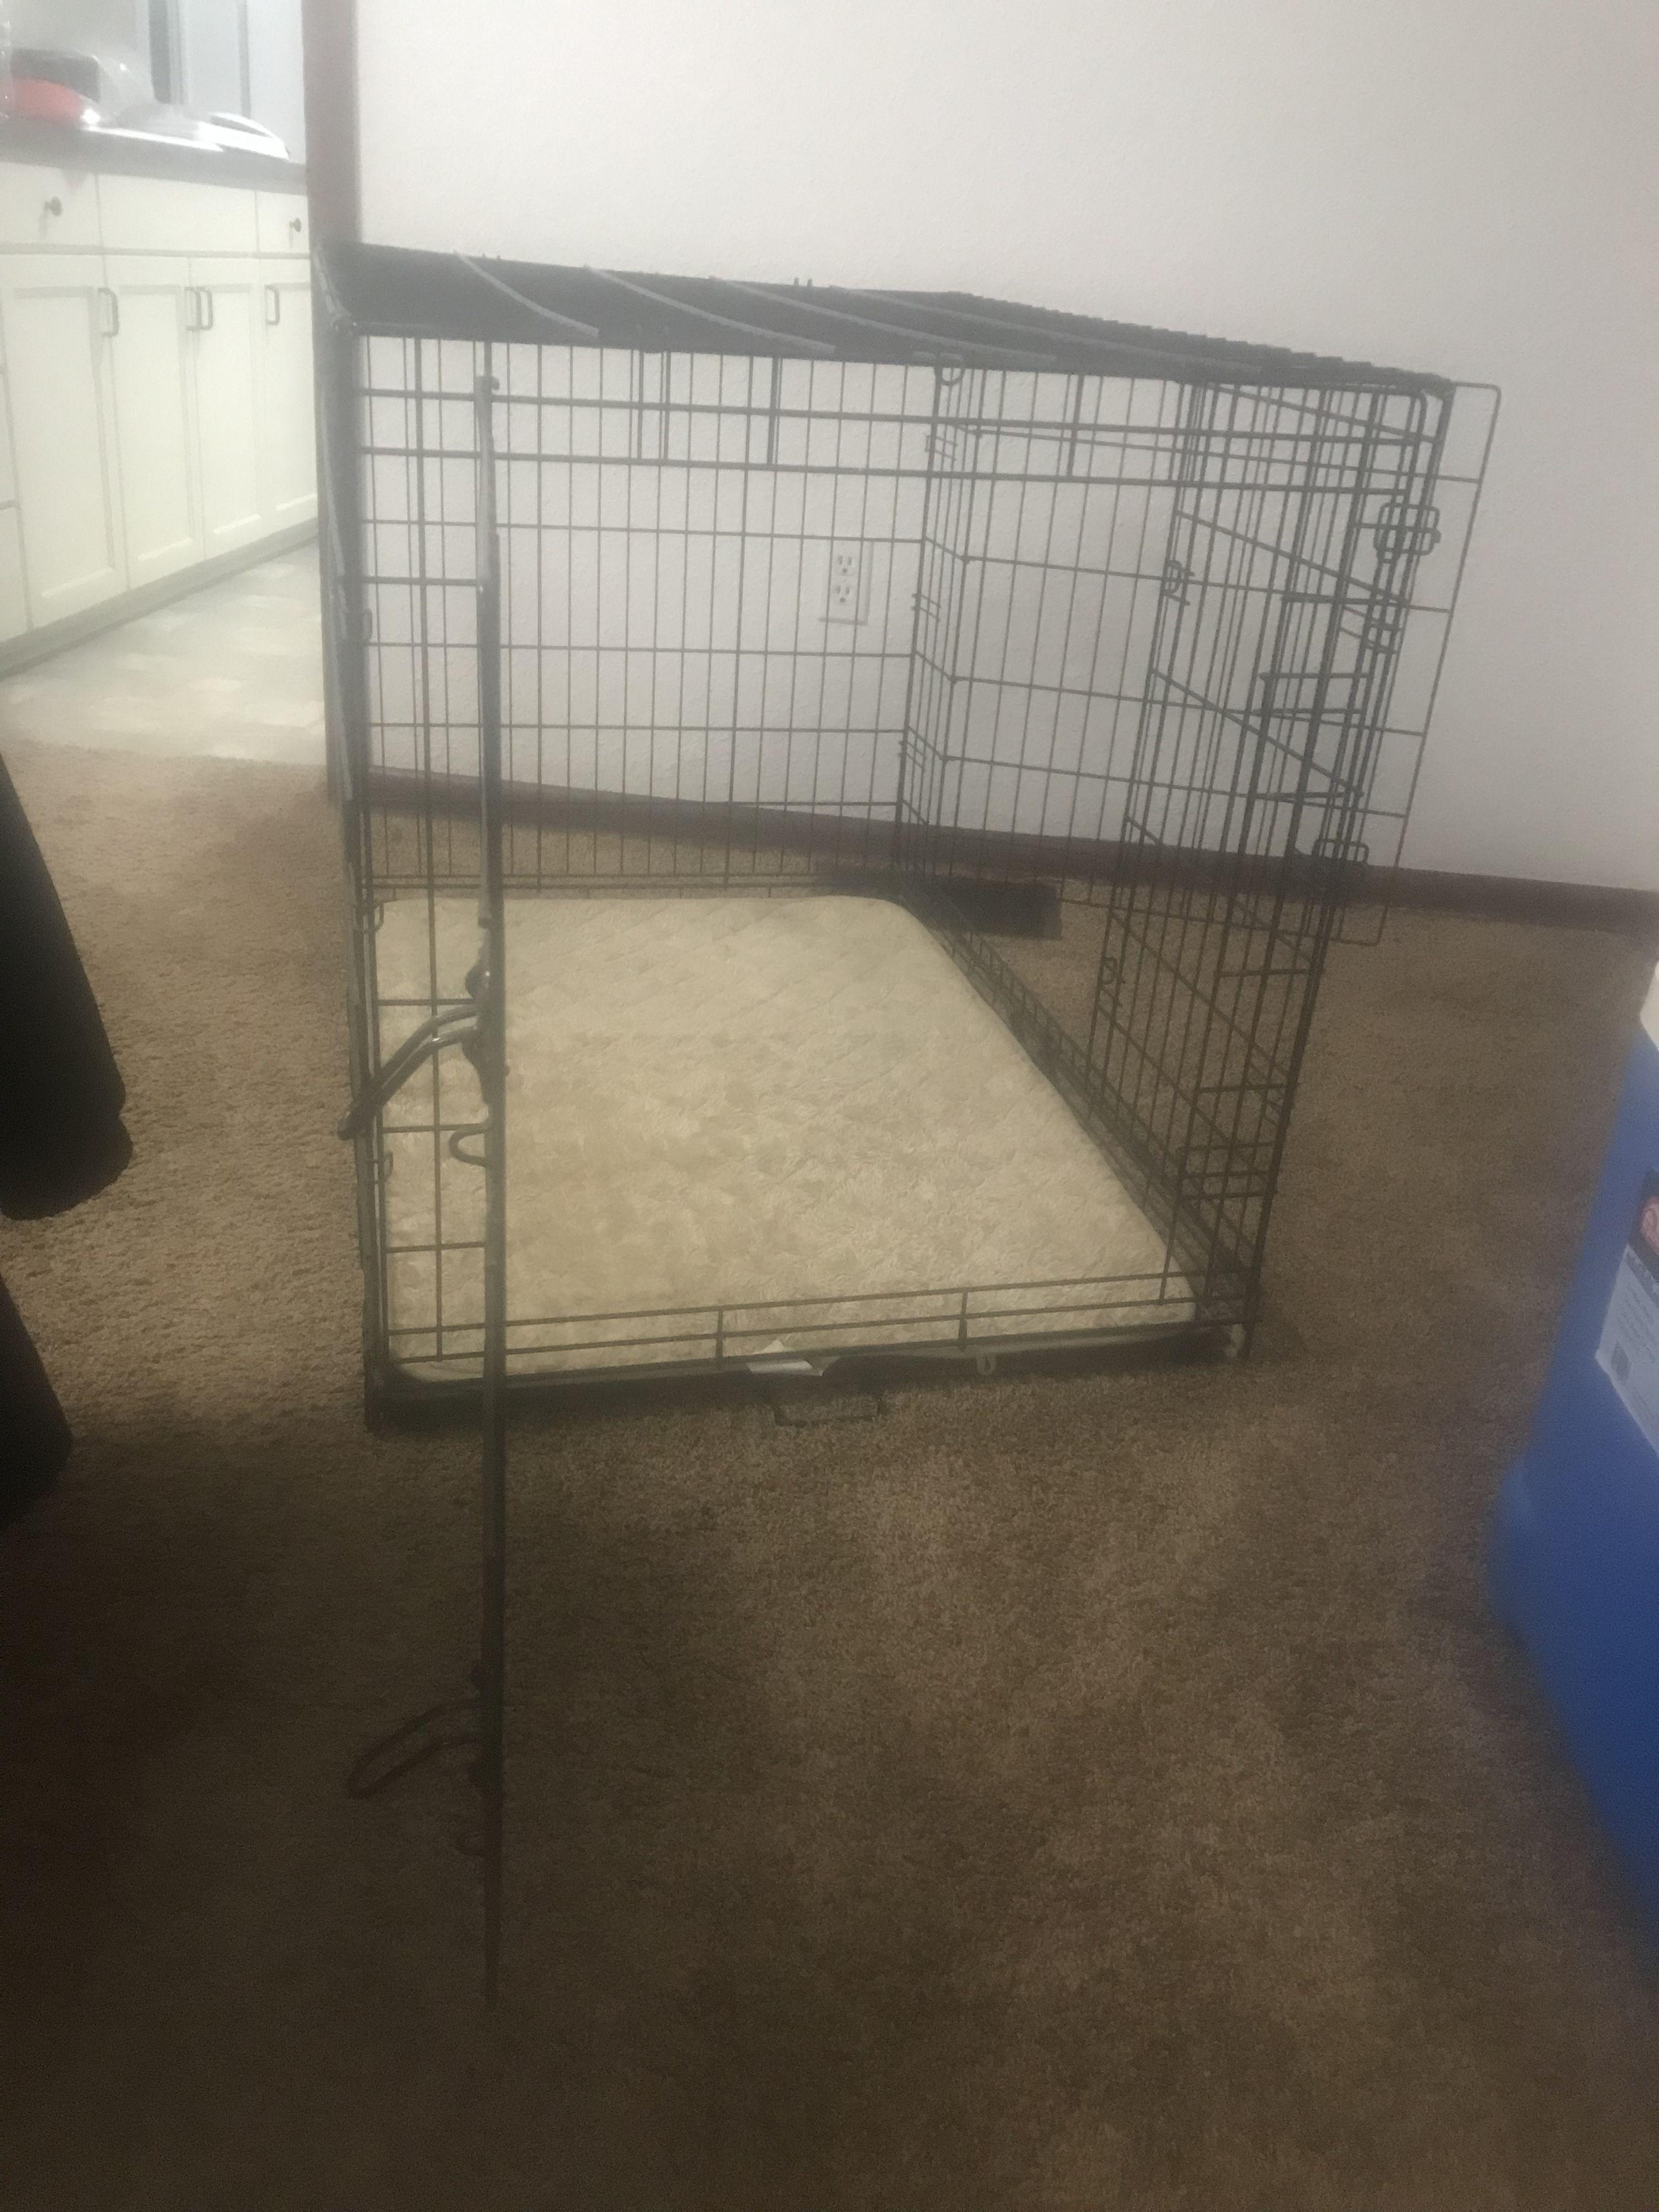 Dog crate image 1